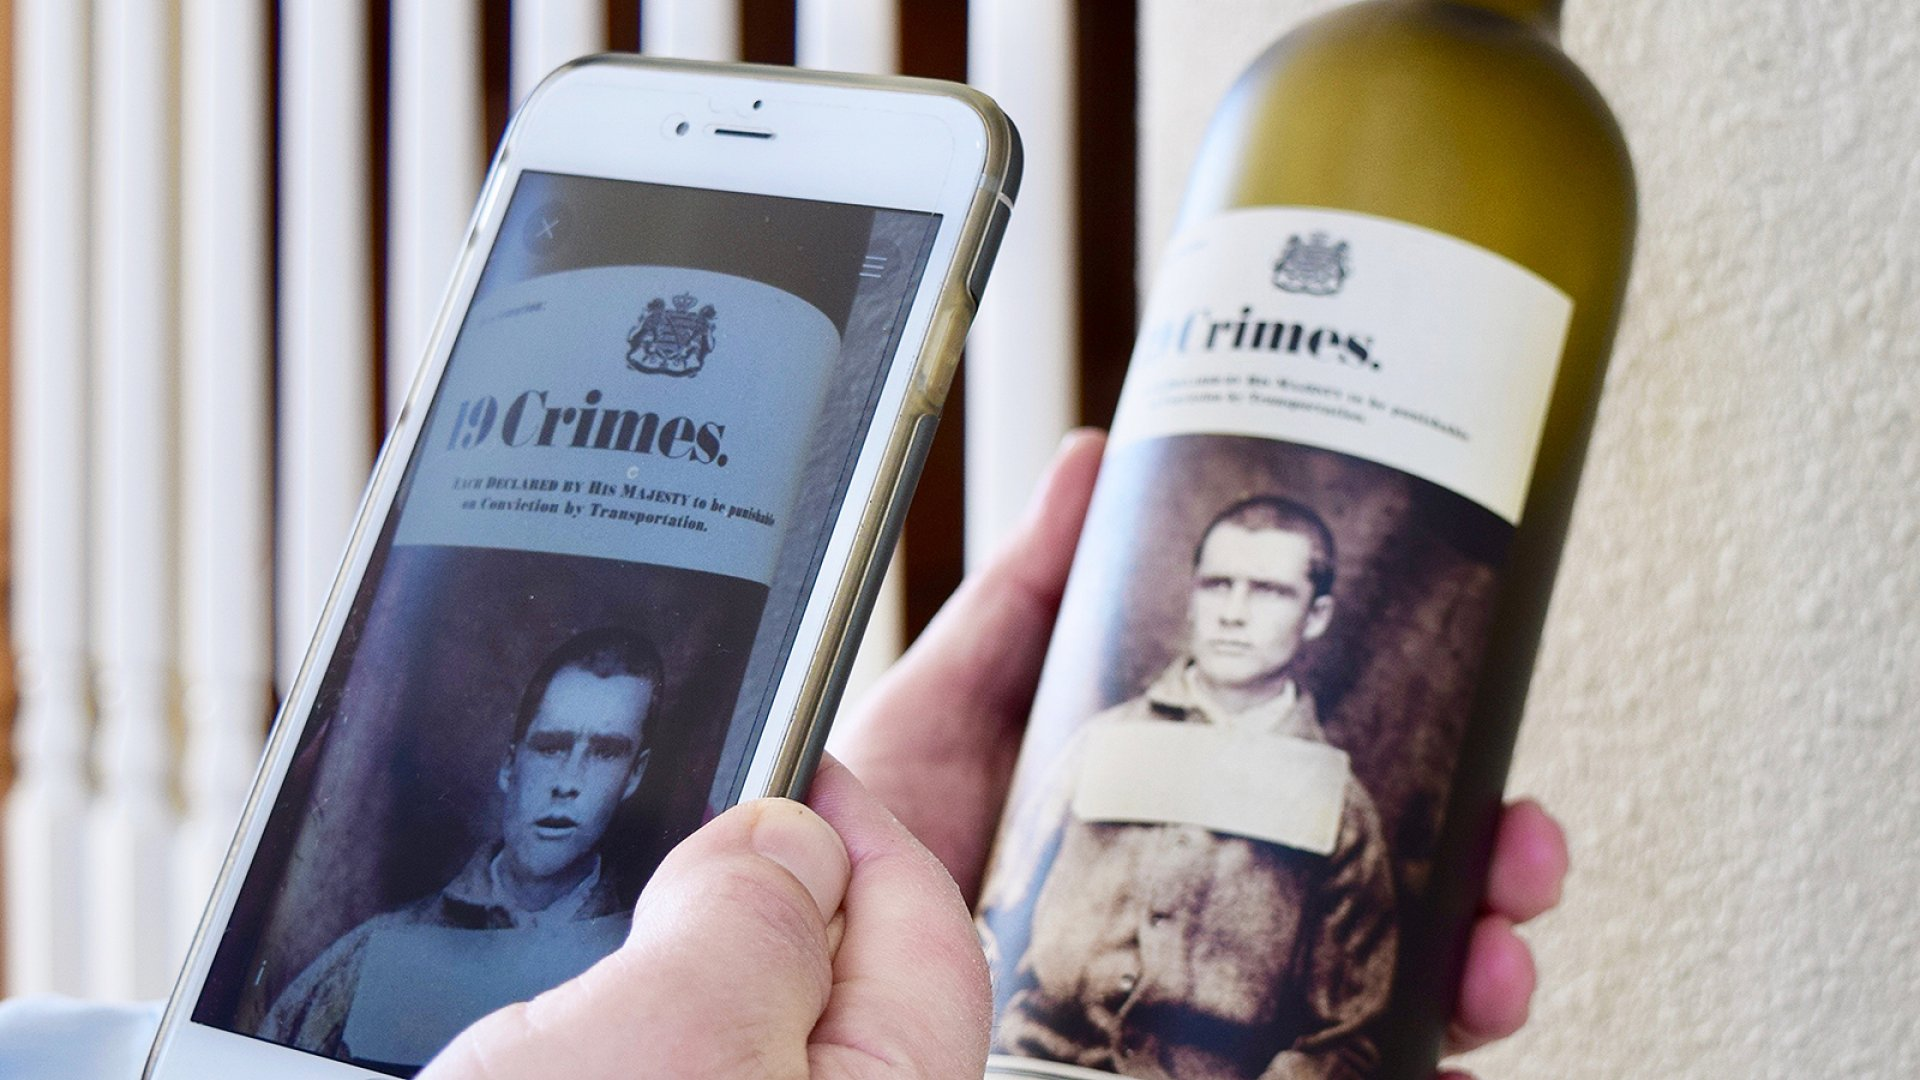 19 Crimes' talking wine label by TWE.